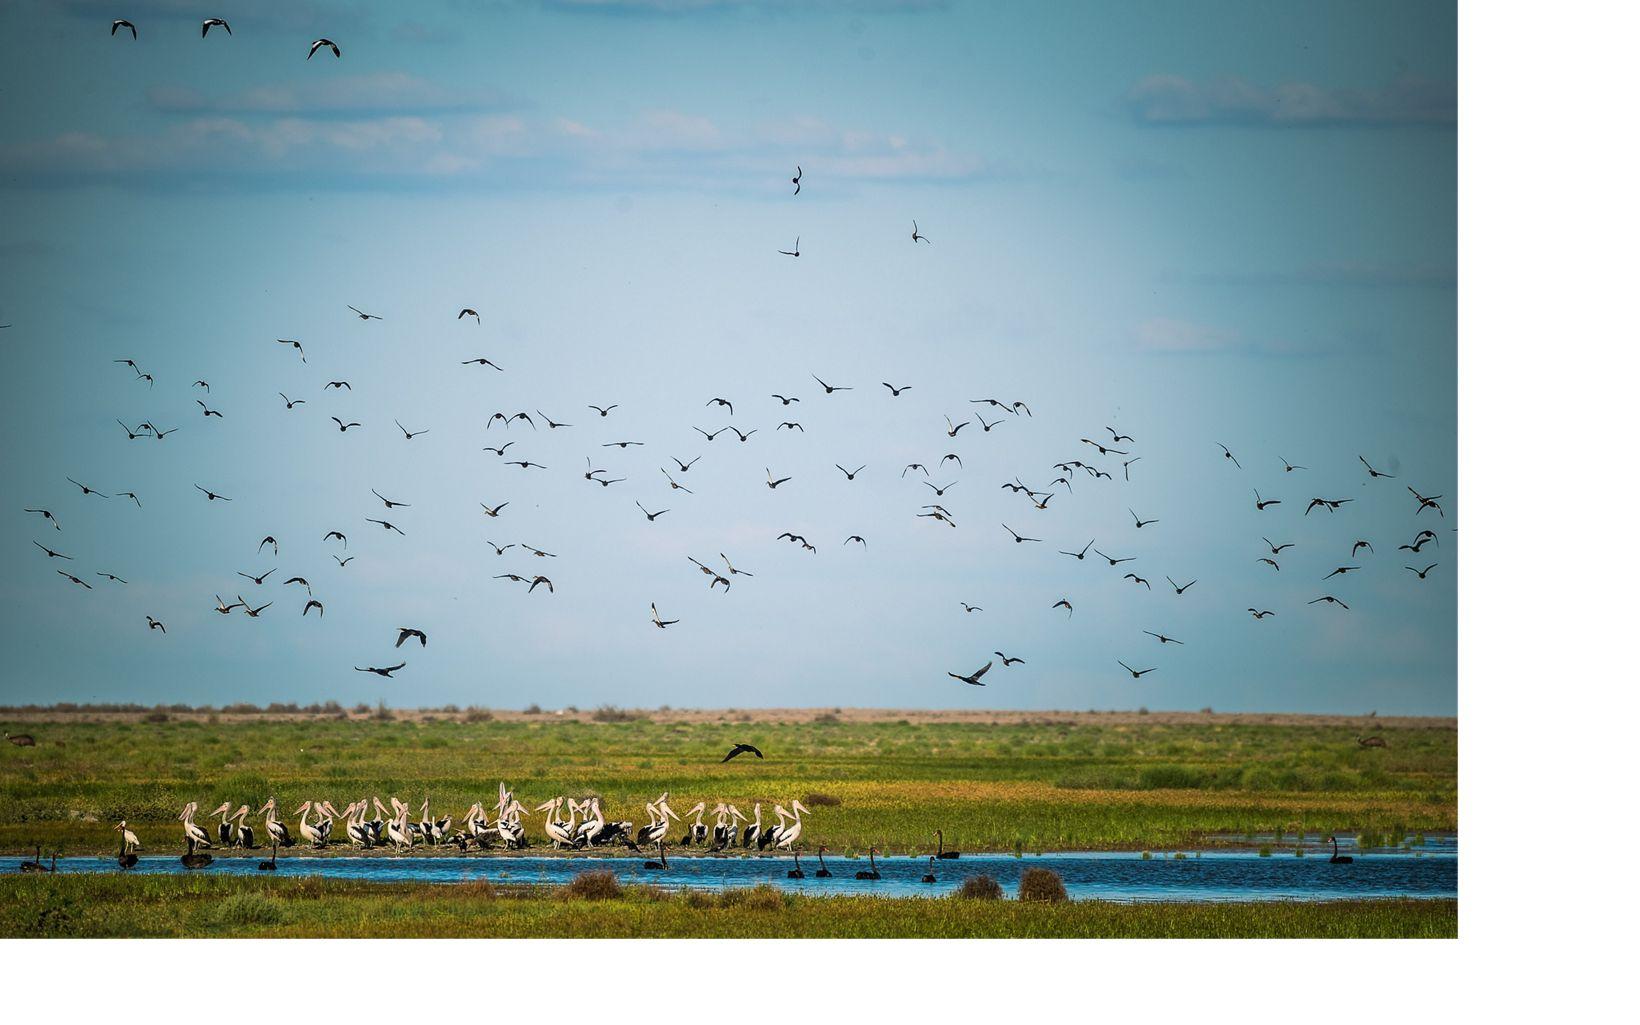 Pacific Black Ducks, Great Cormorants, Black Swans and Australian Pelicans